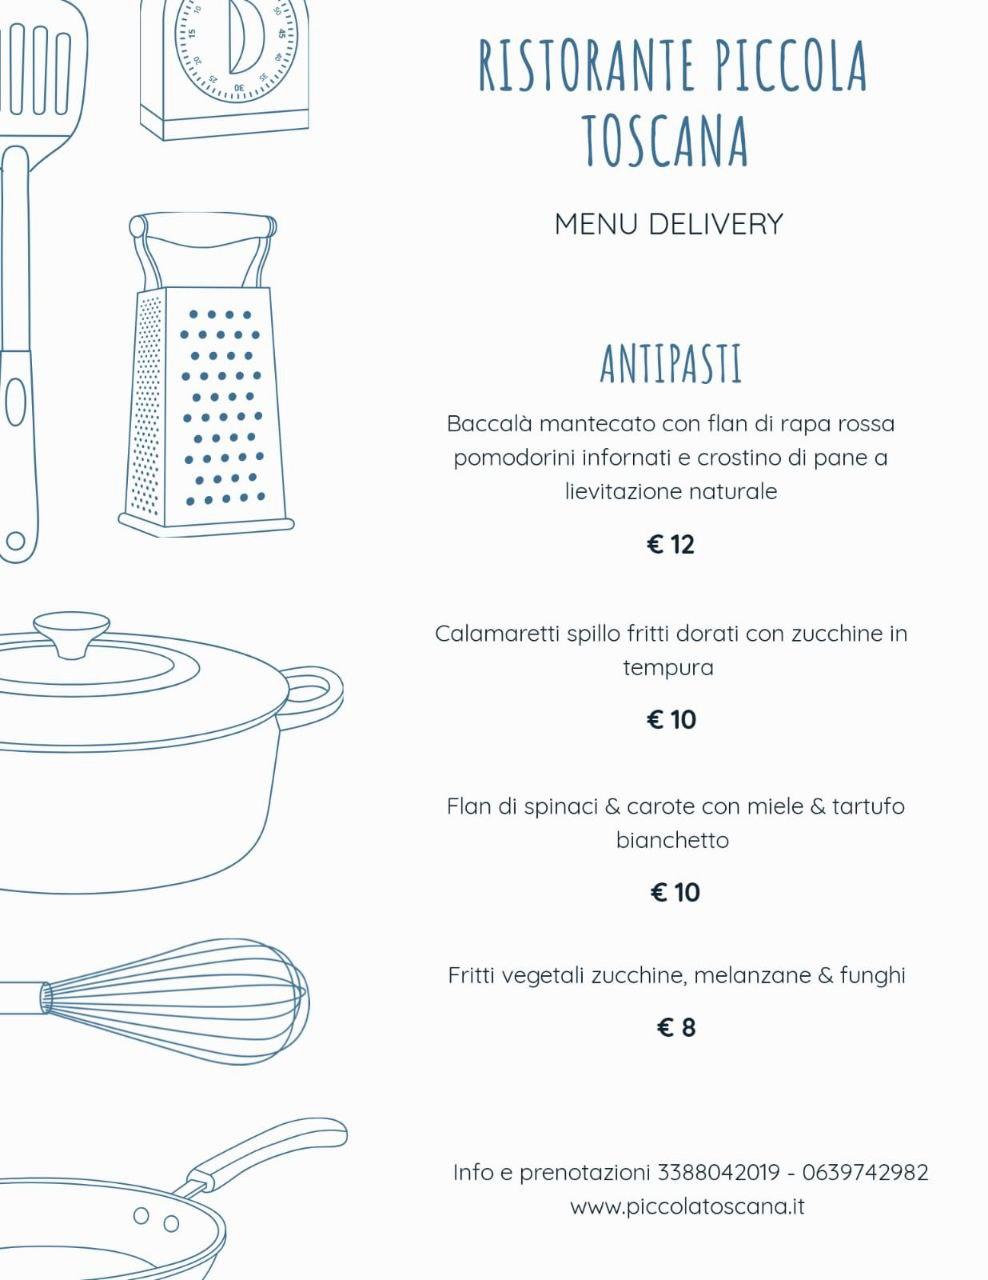 antipasti menu delivery